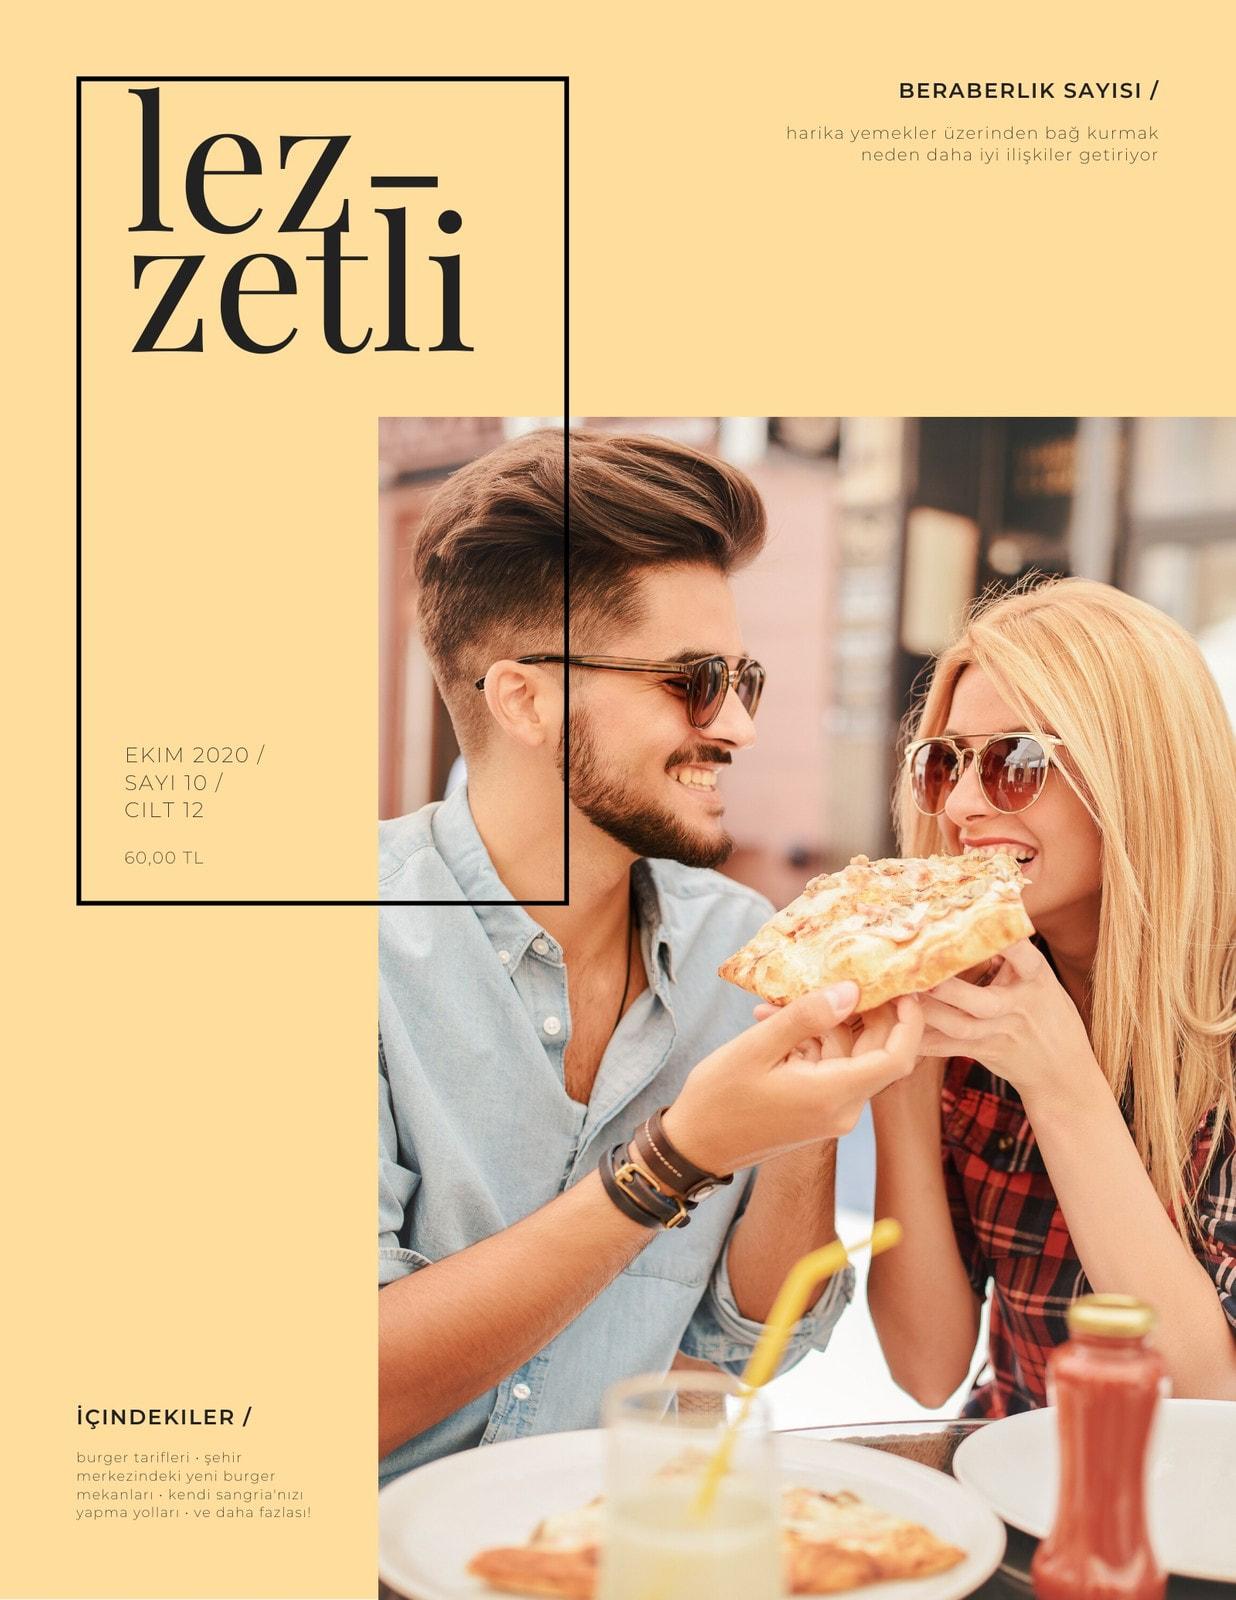 Krem Siyah ve Beyaz Modern Yemek Dergi